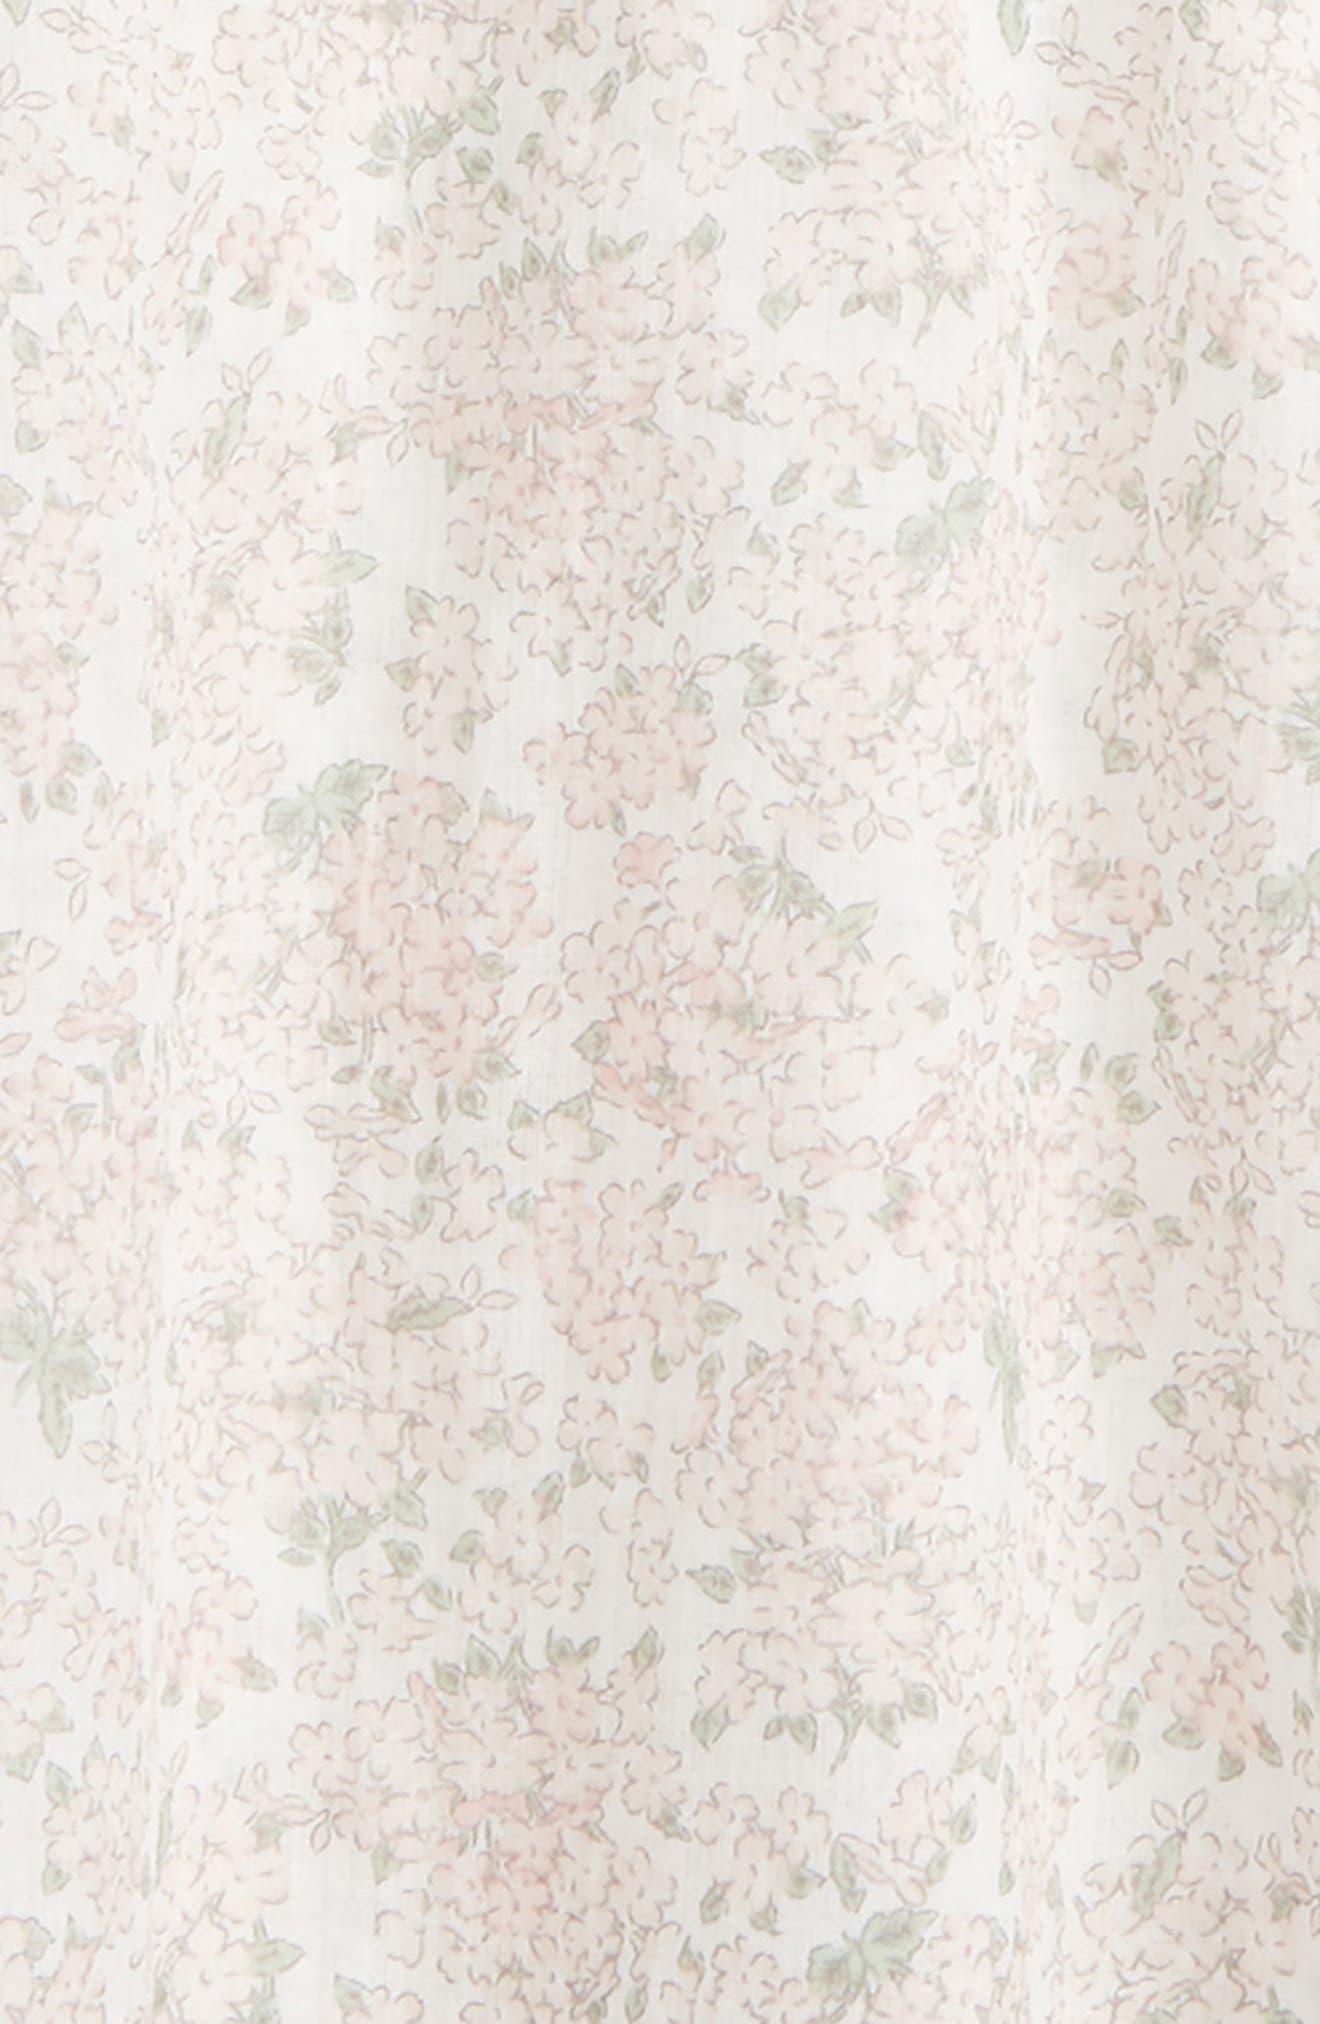 Felia Floral Print Blouse,                             Alternate thumbnail 2, color,                             900